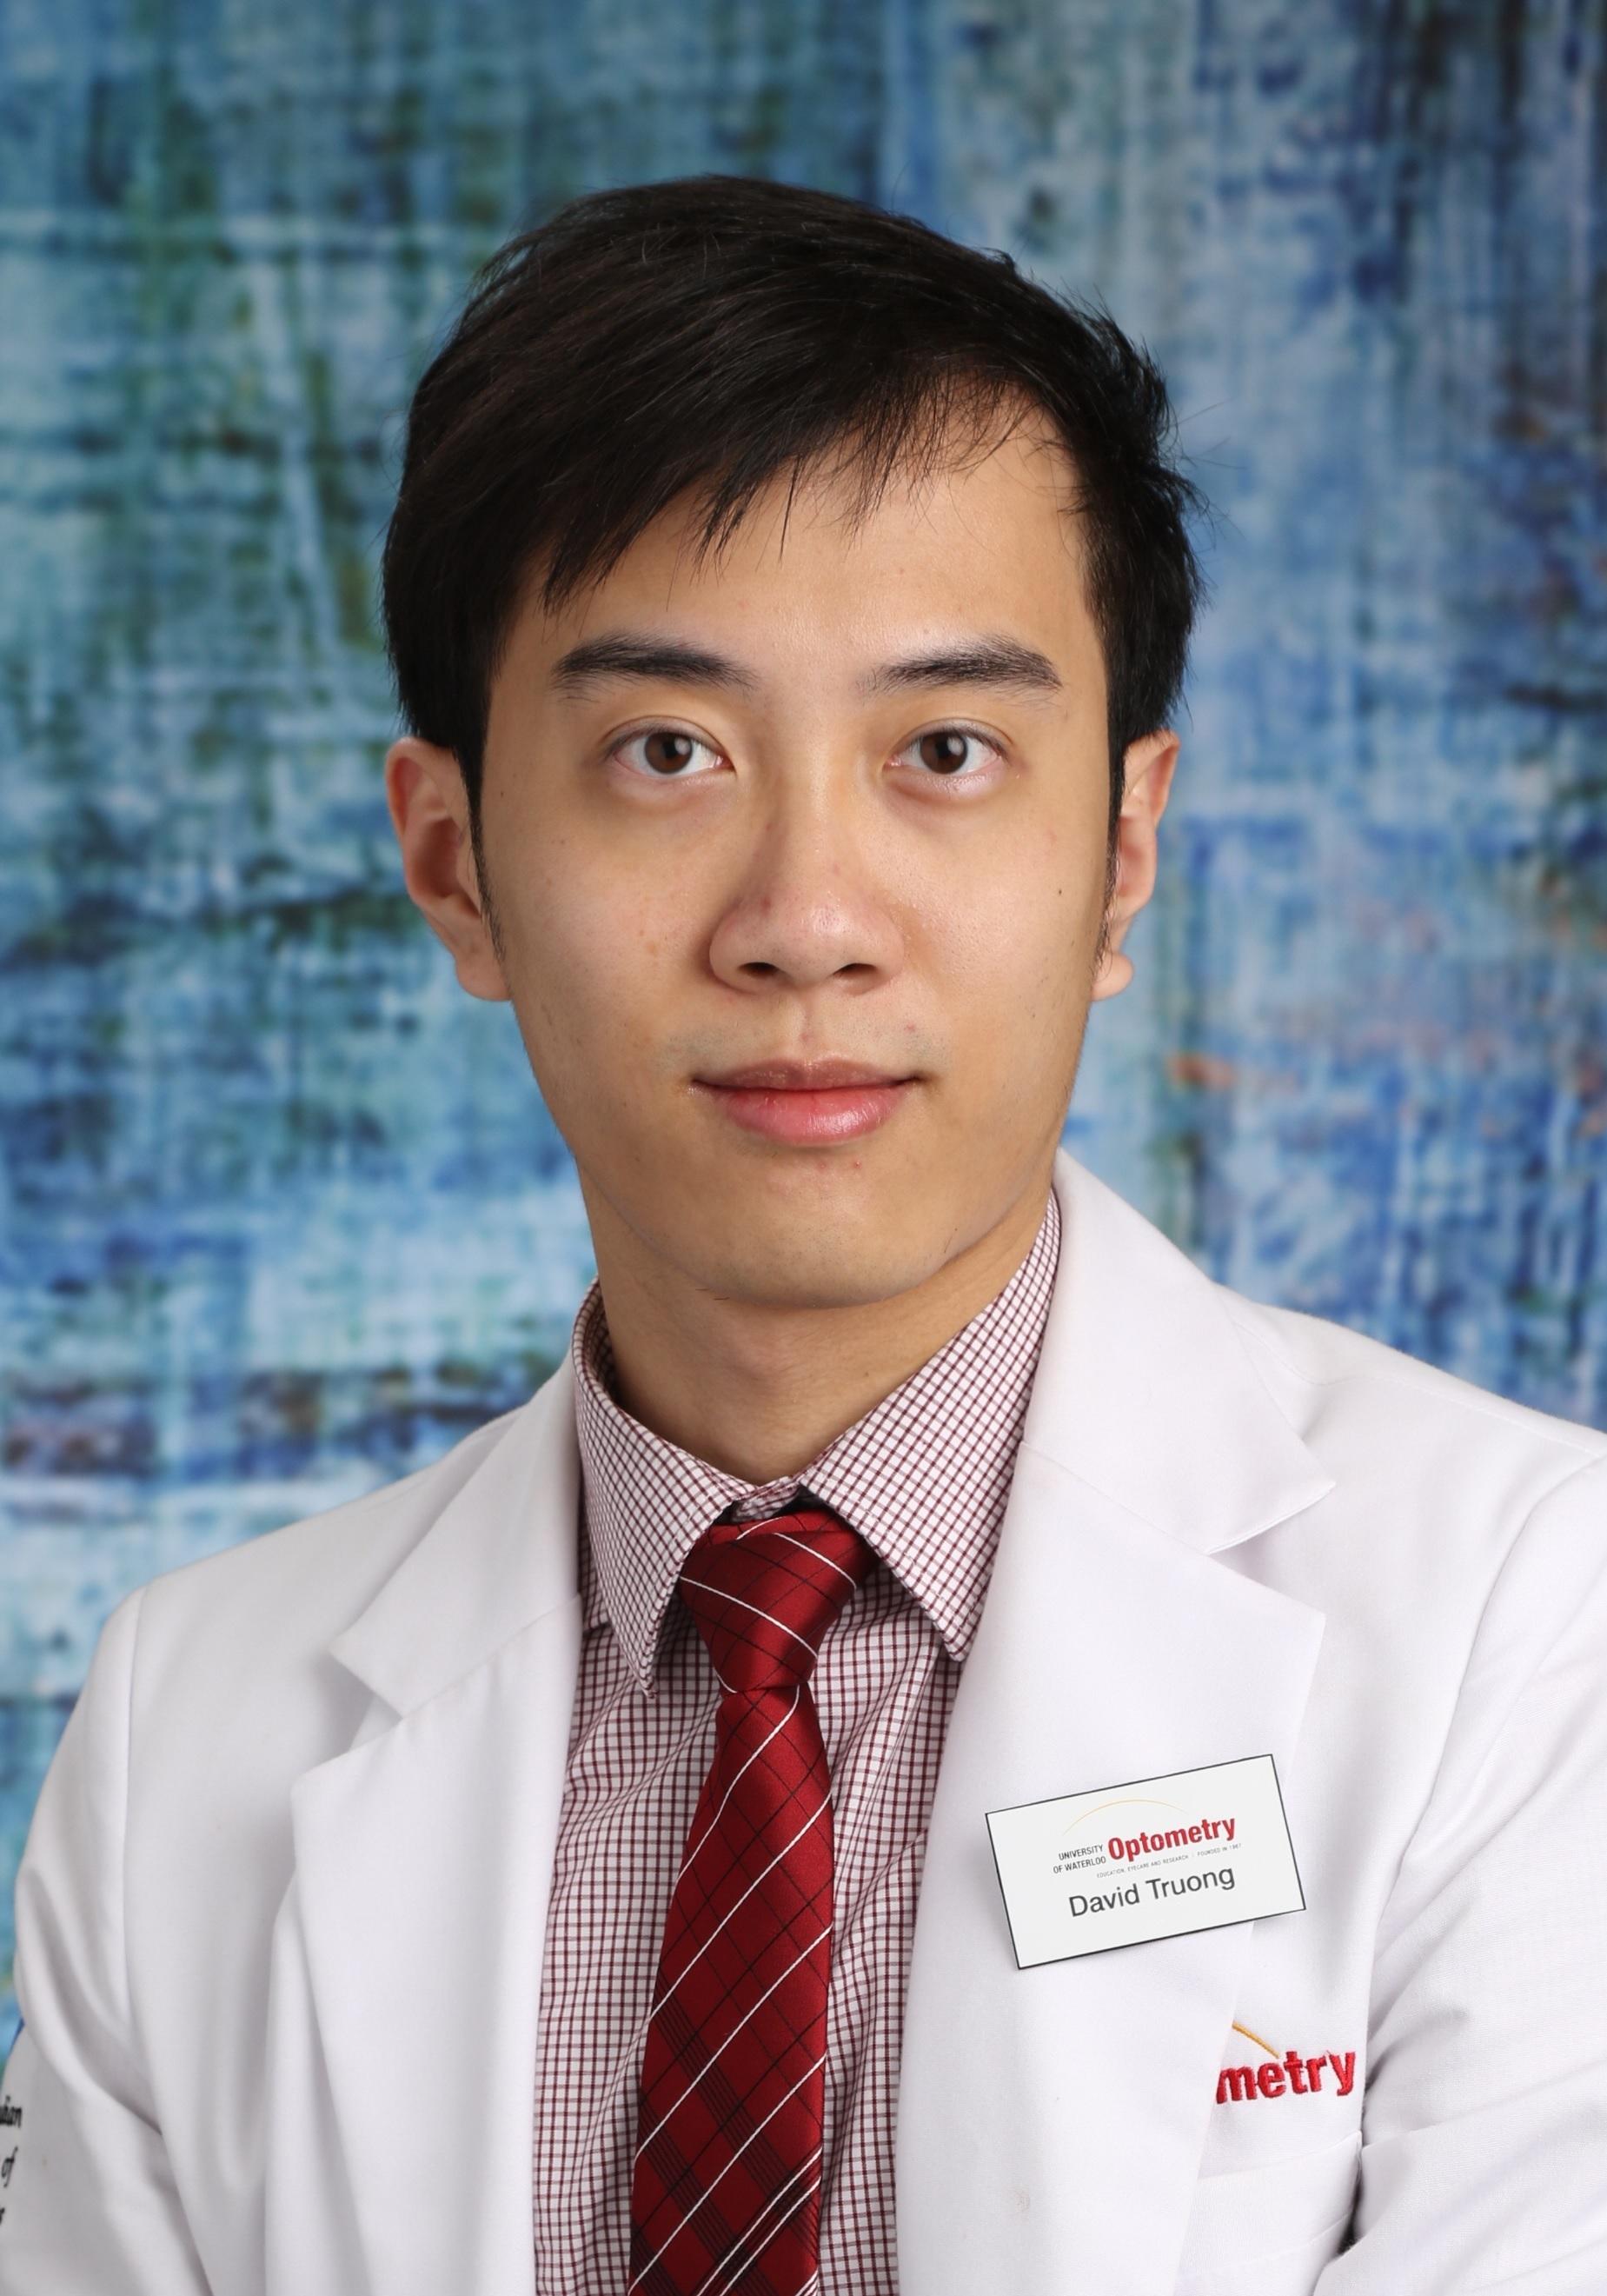 Dr.-David-Truong-Bio-Photo